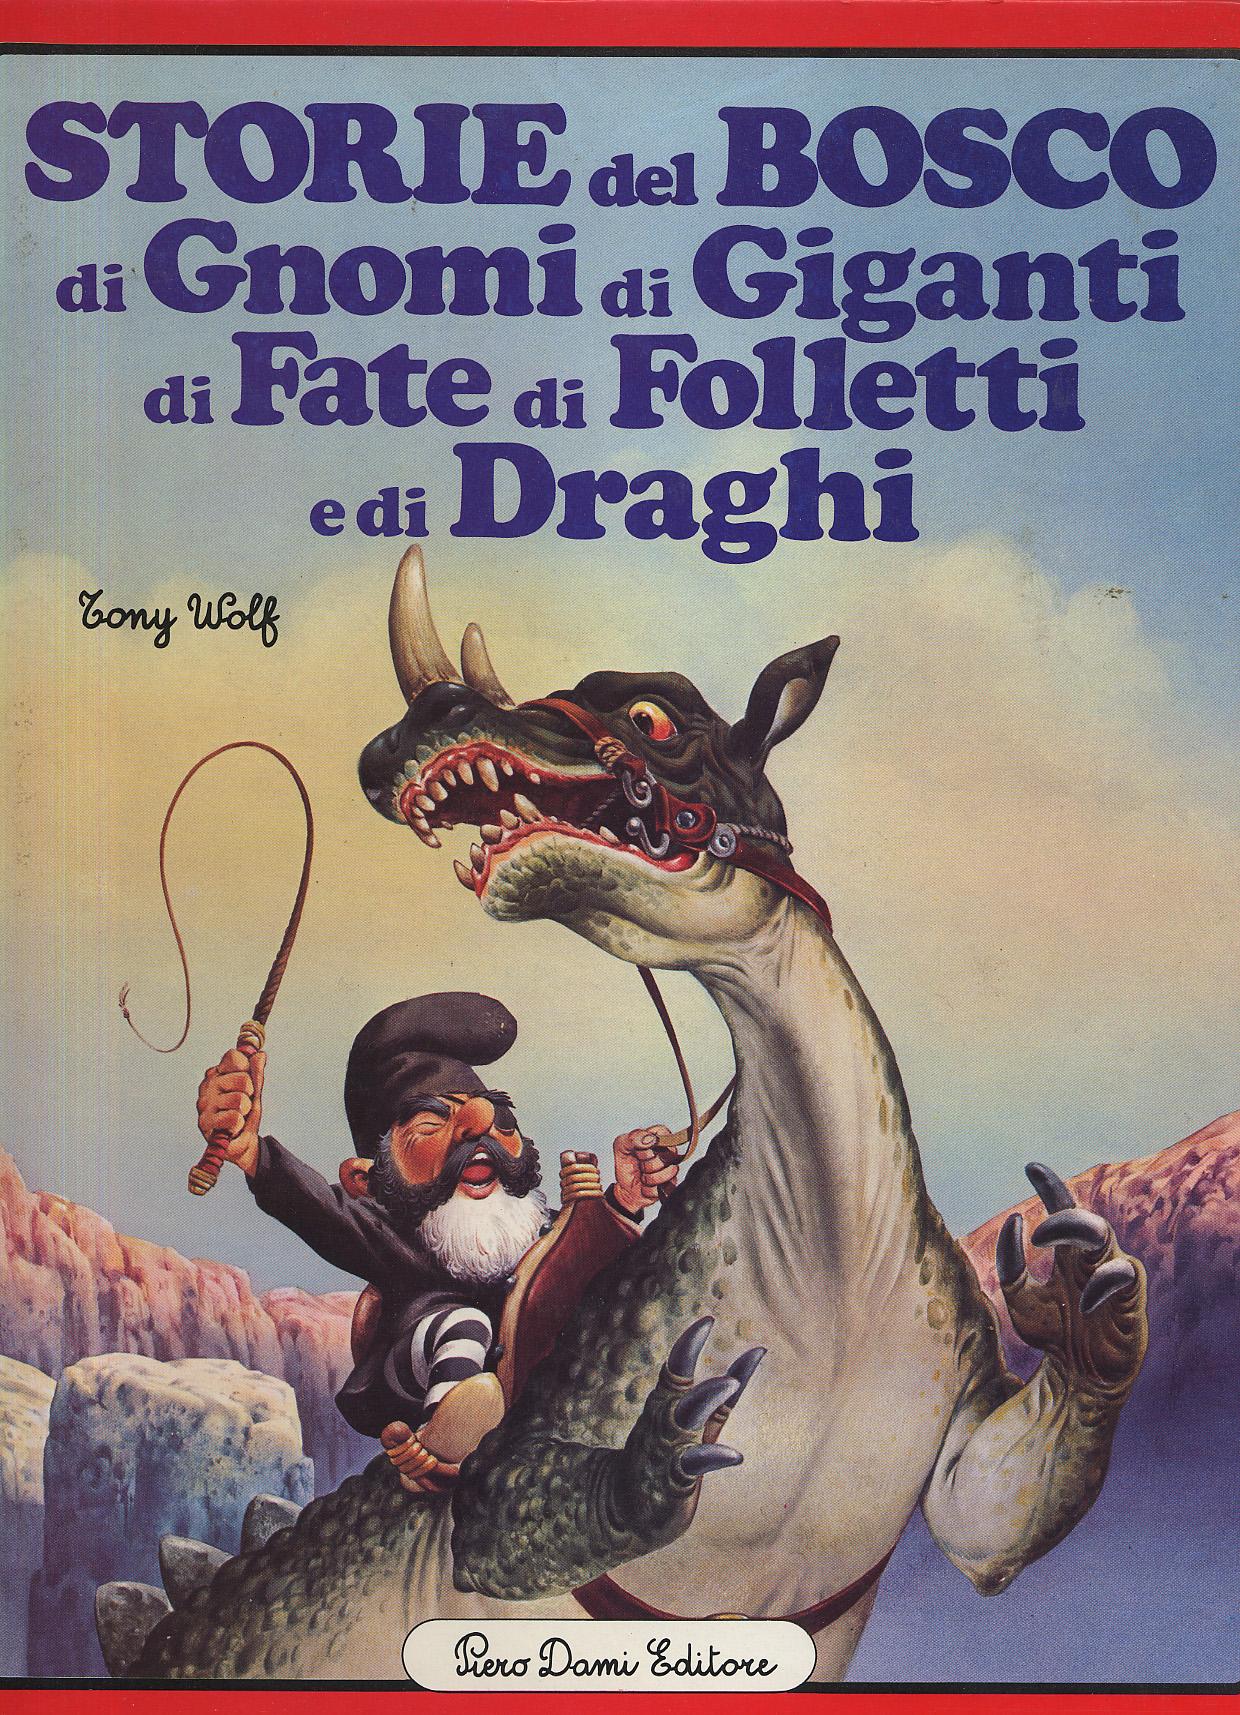 Storie del bosco di gnomi di giganti di fate di folletti e di draghi